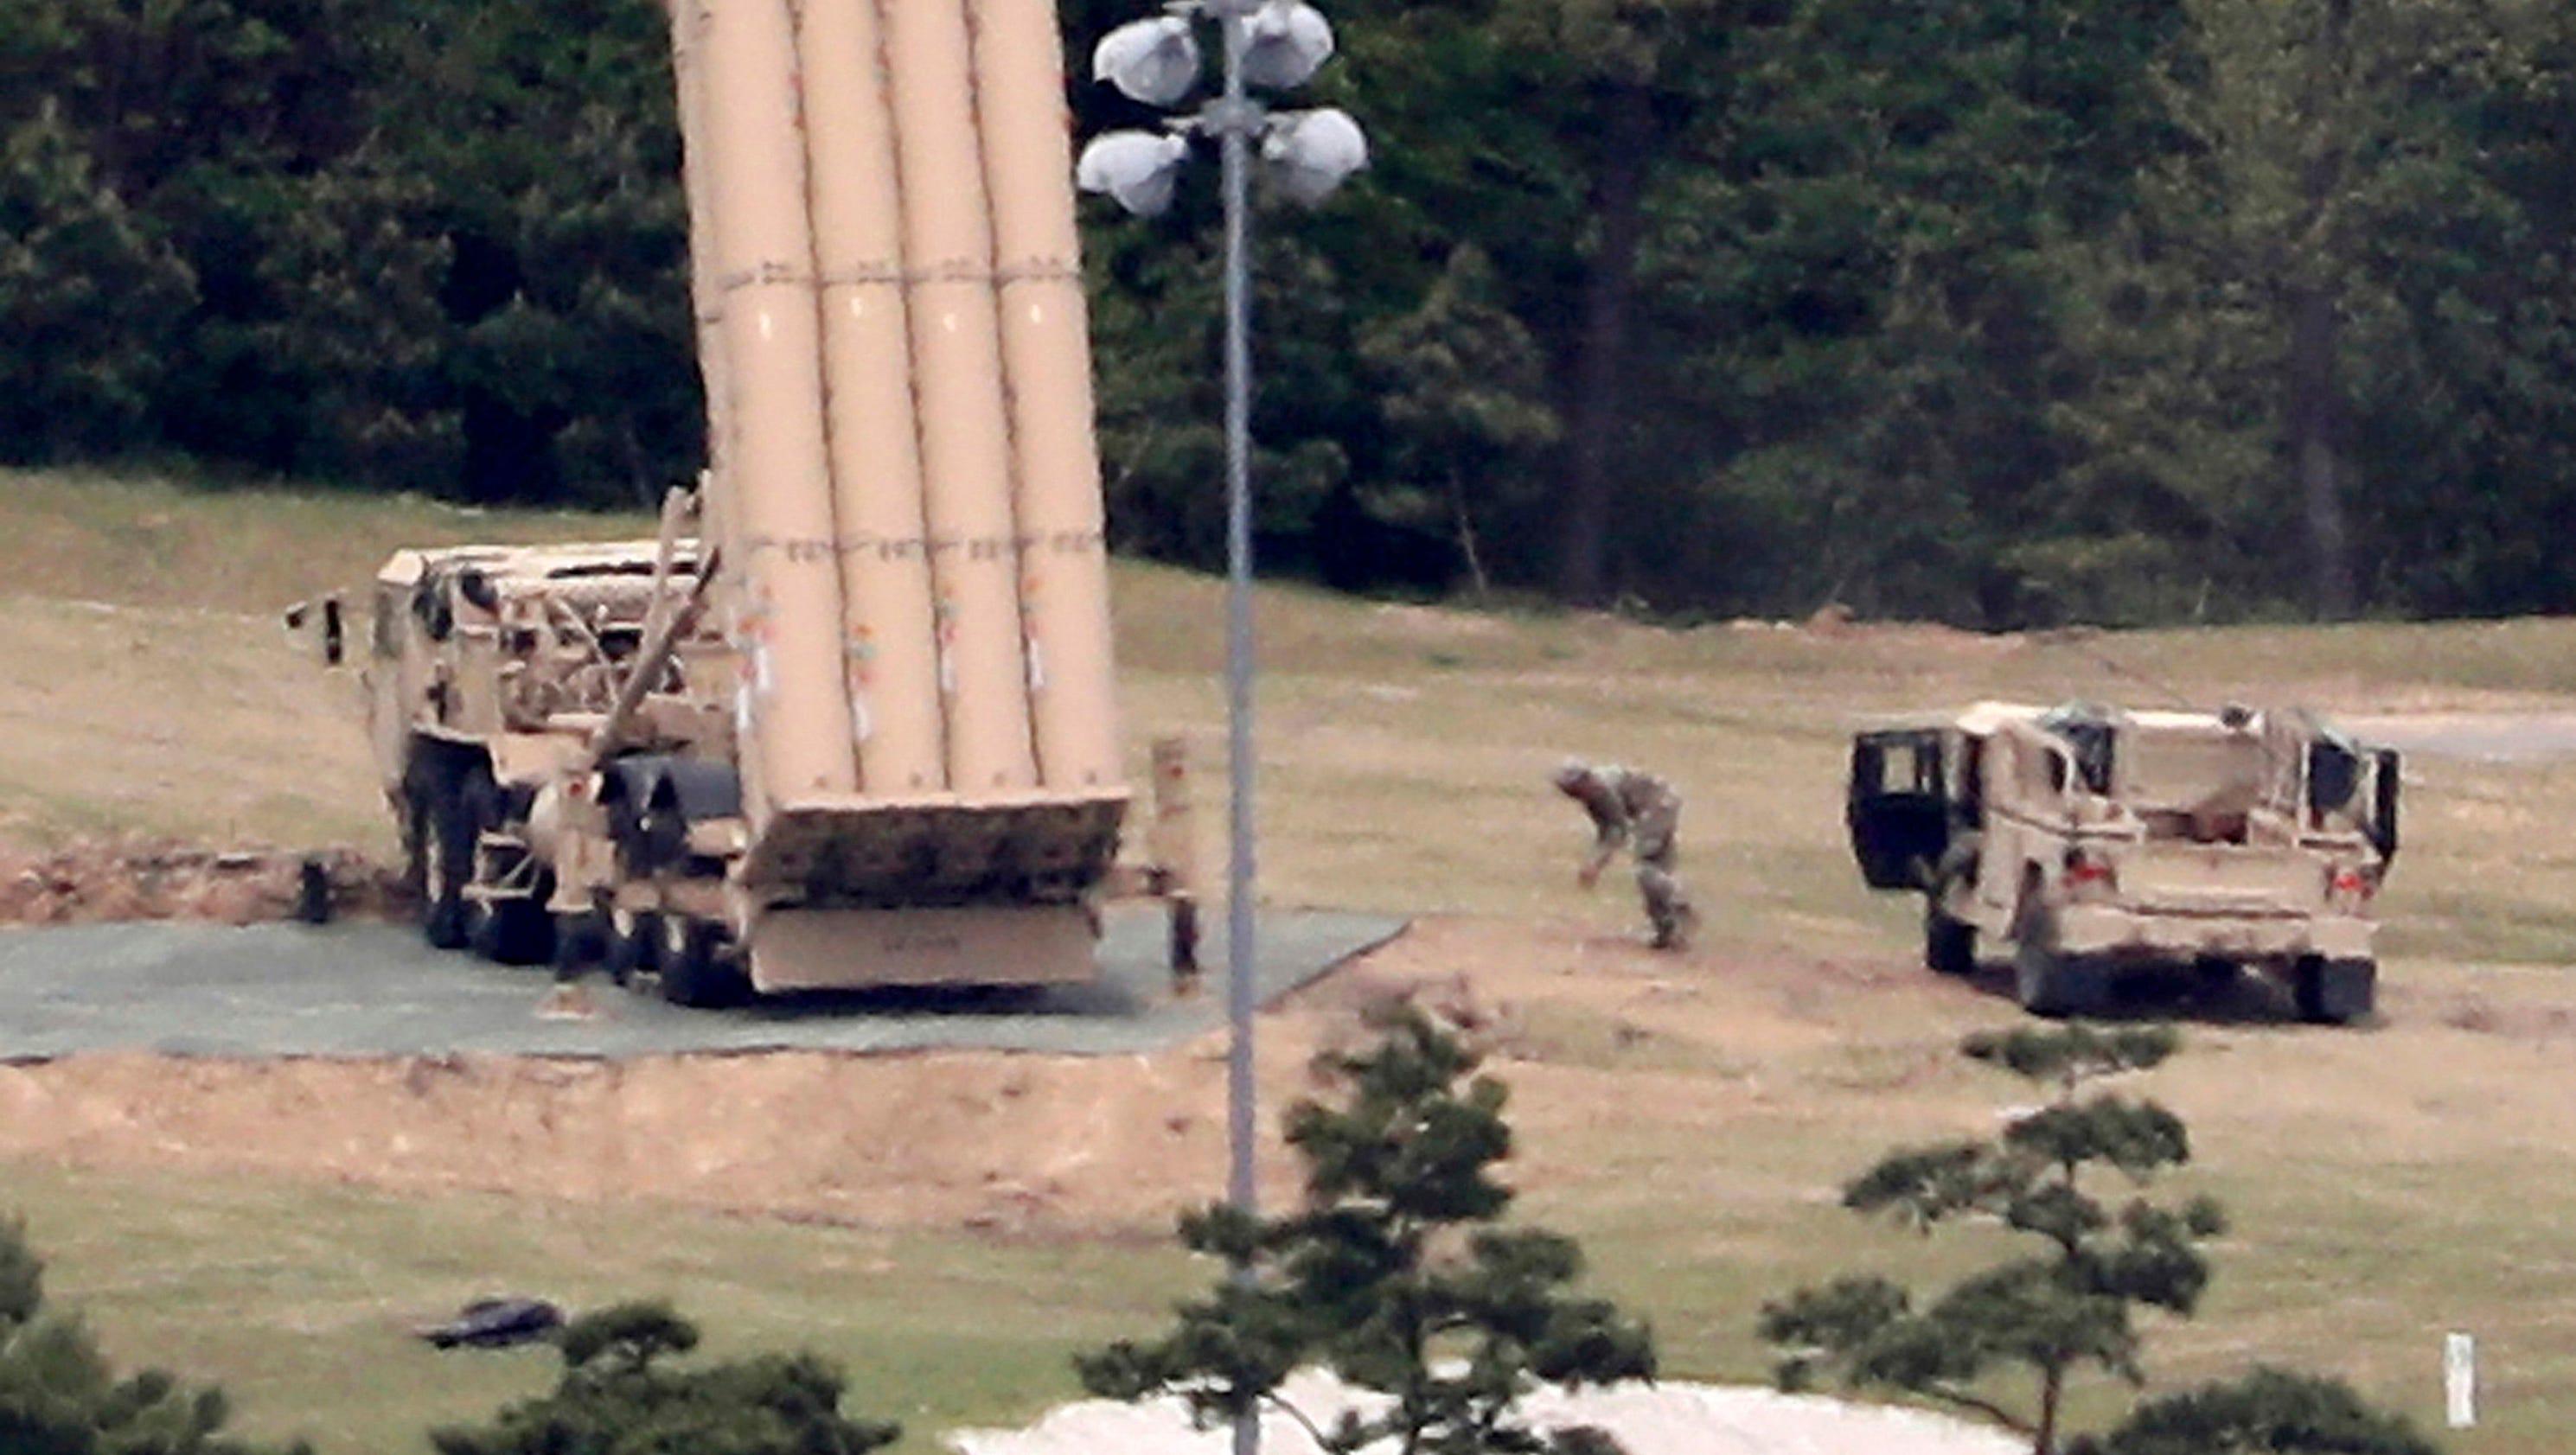 N. Korea fires 'unidentified projectile'